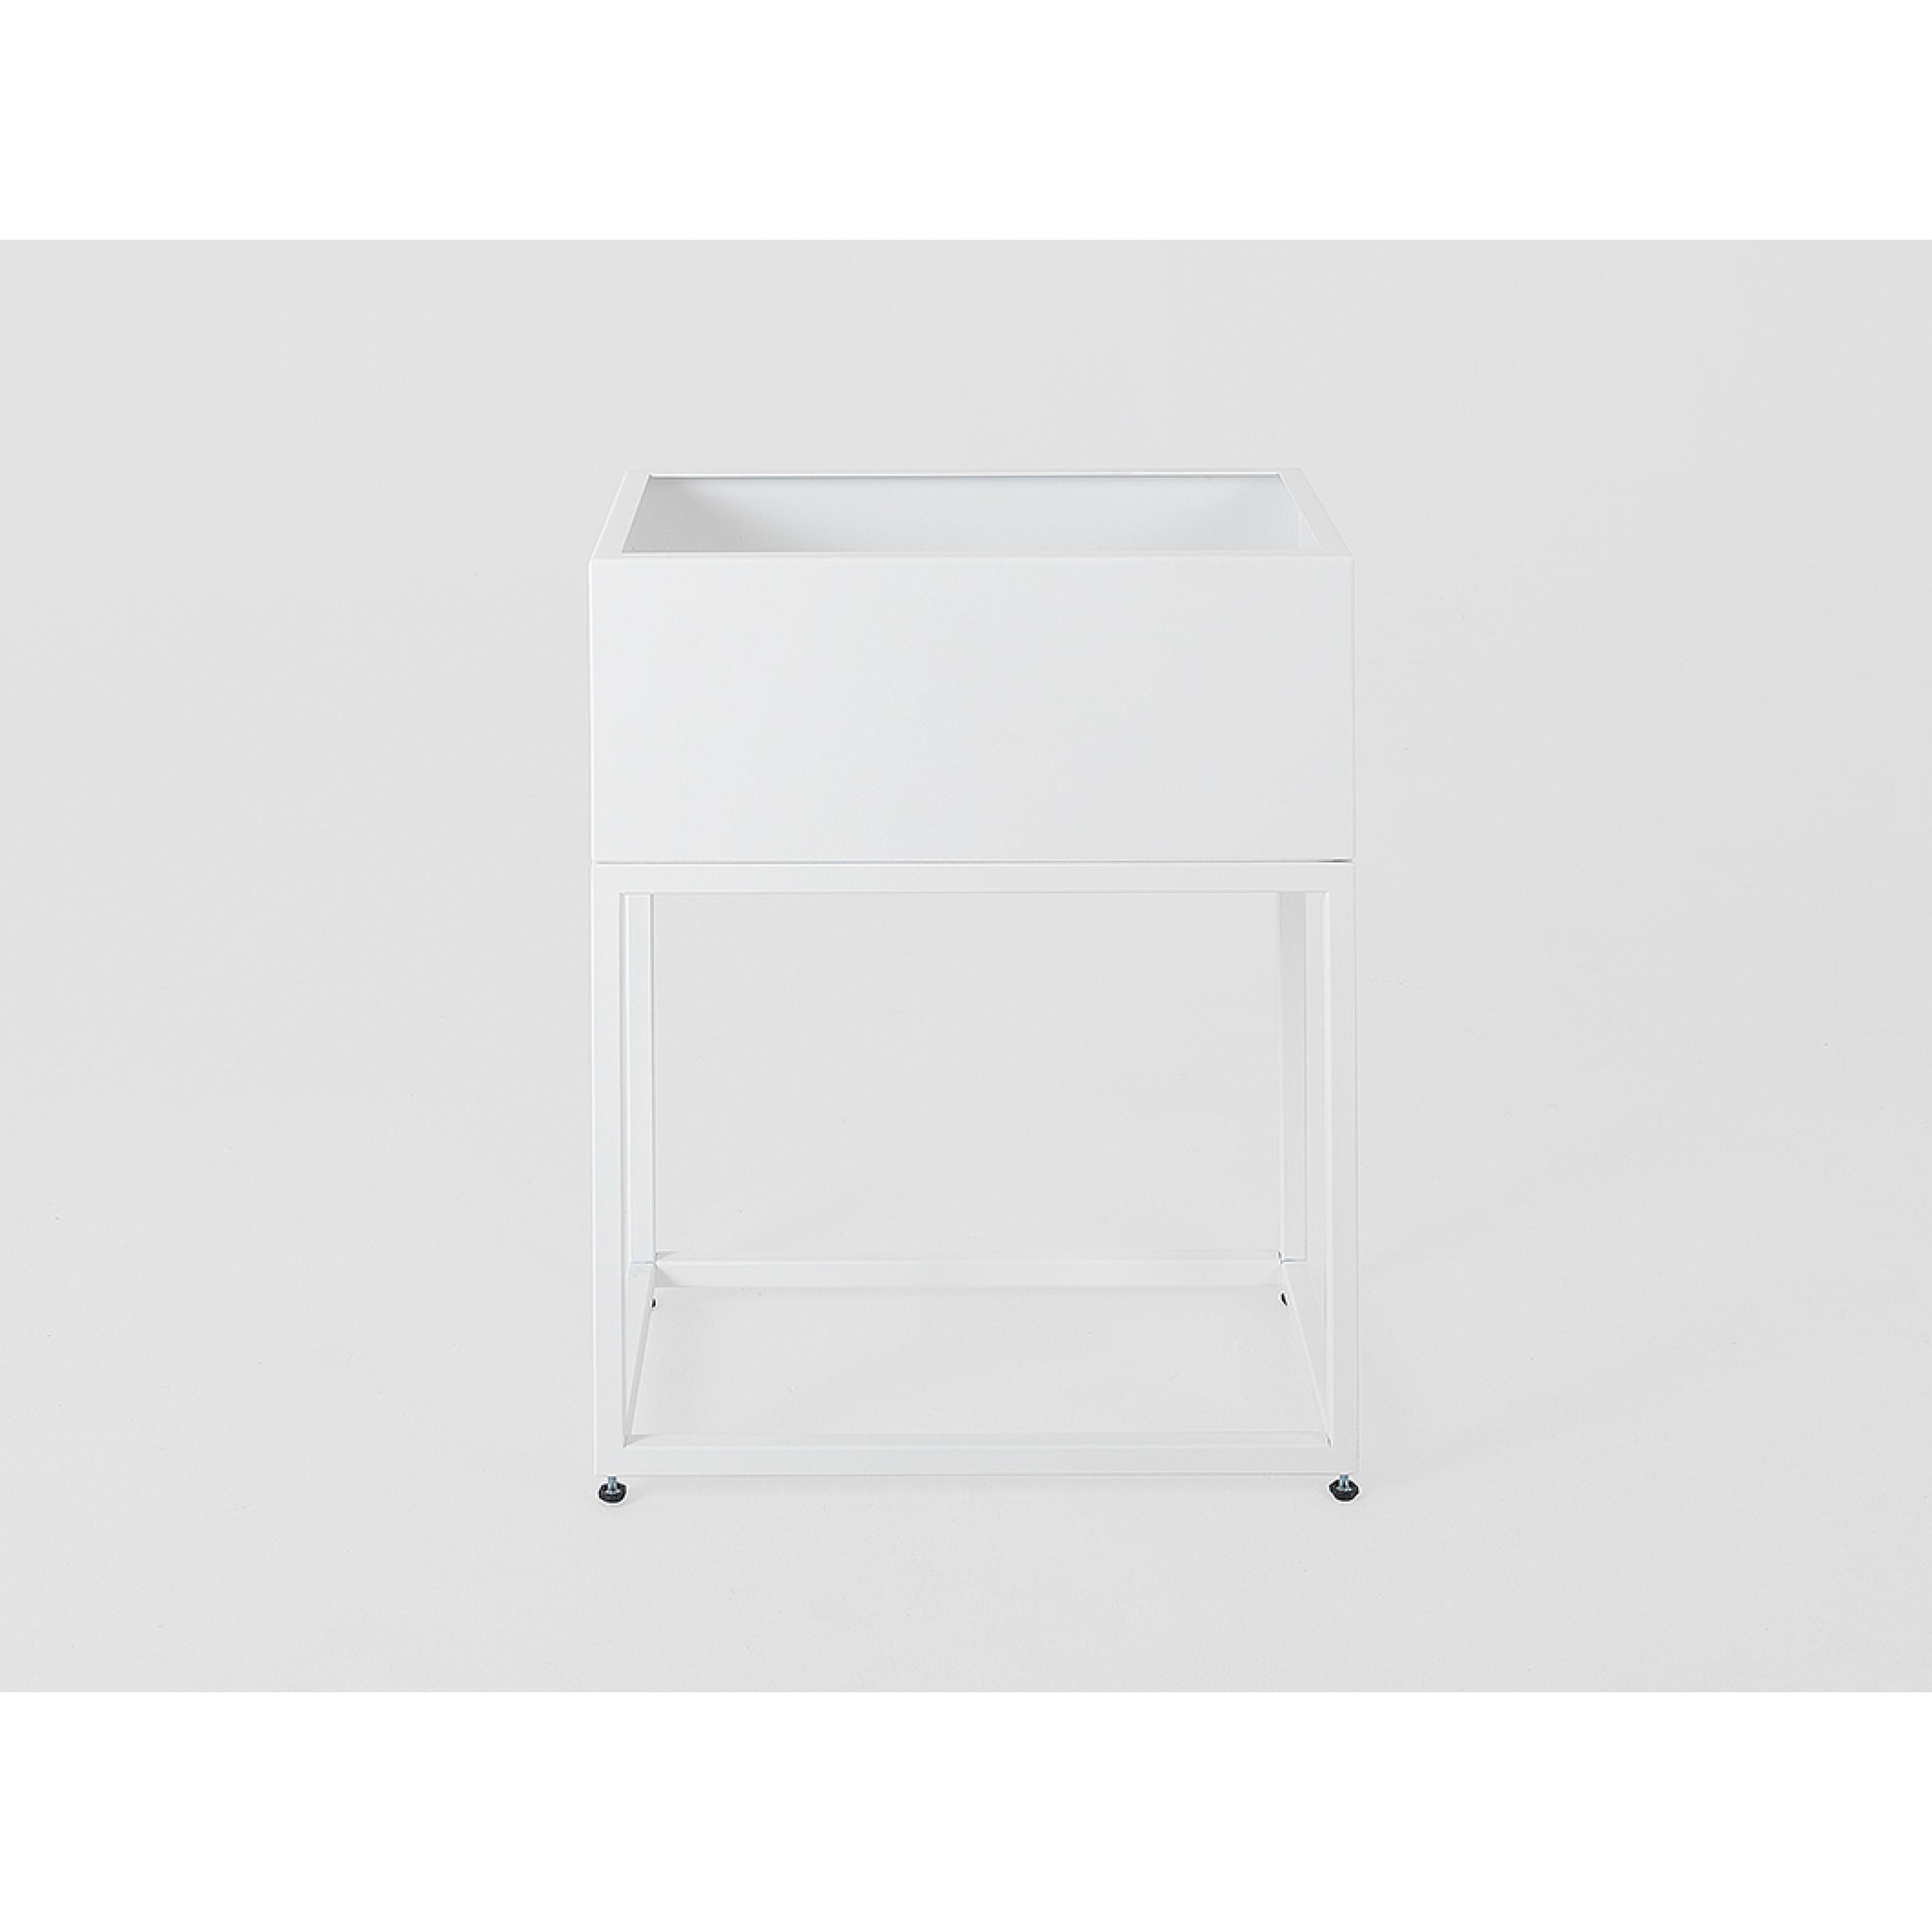 Pflanztopf Fiorina | Metall | 50 x 30 x 60 cm | Weiß